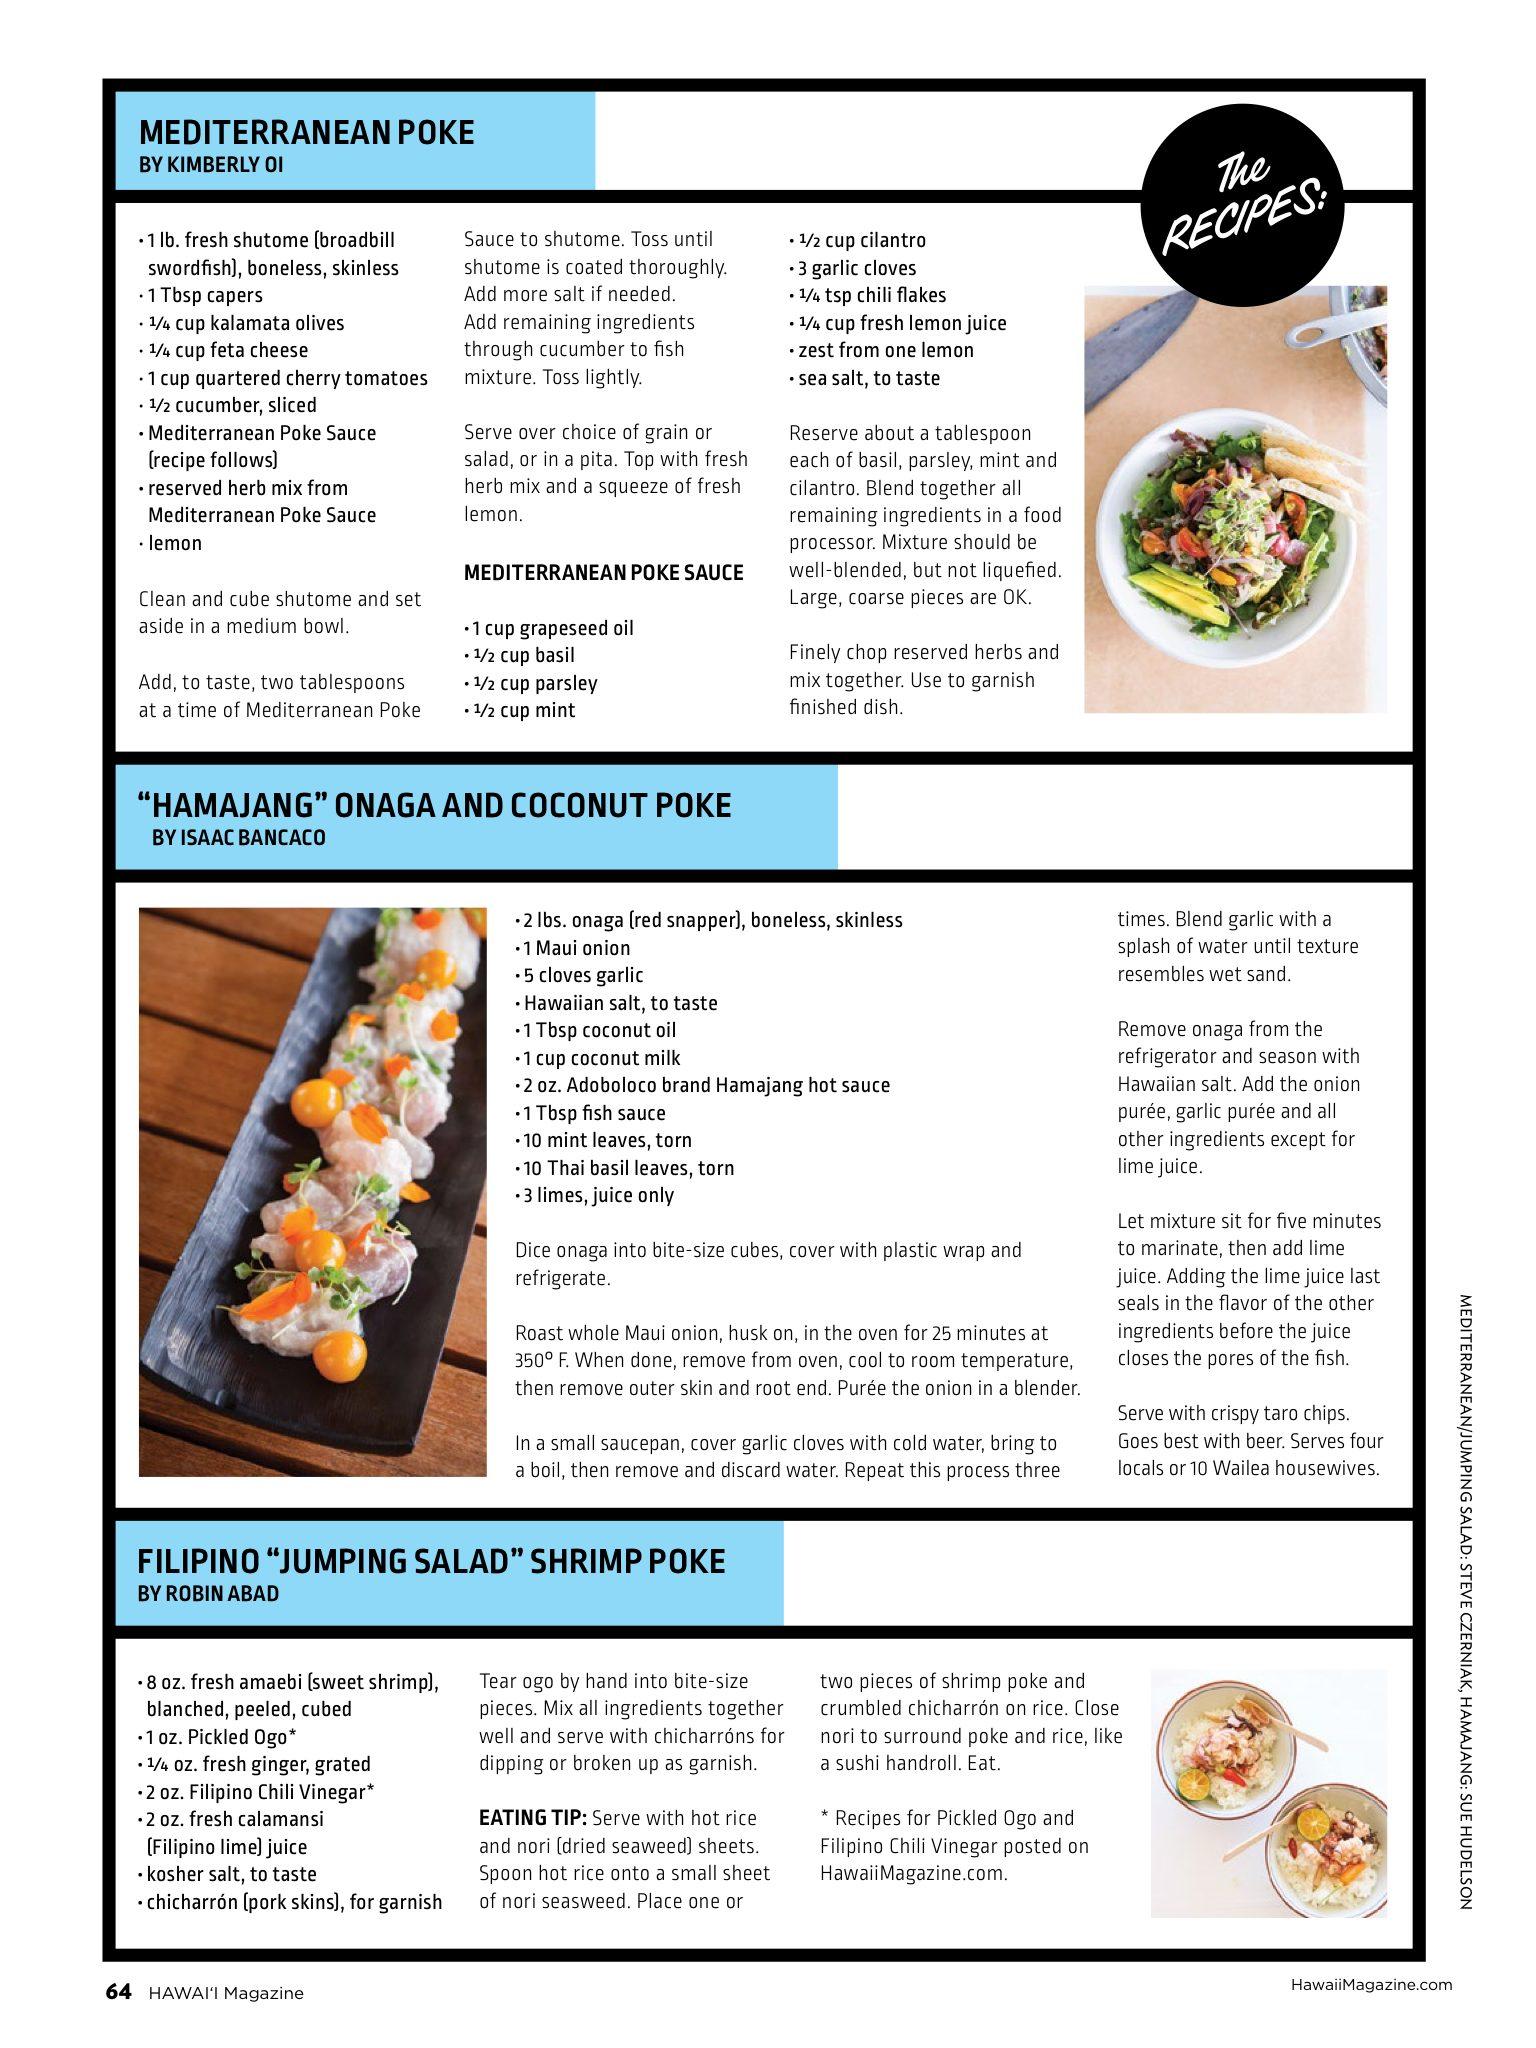 hawaii-magazine-december-2014-hamajang-poke-chef-isaac-bancaco-03